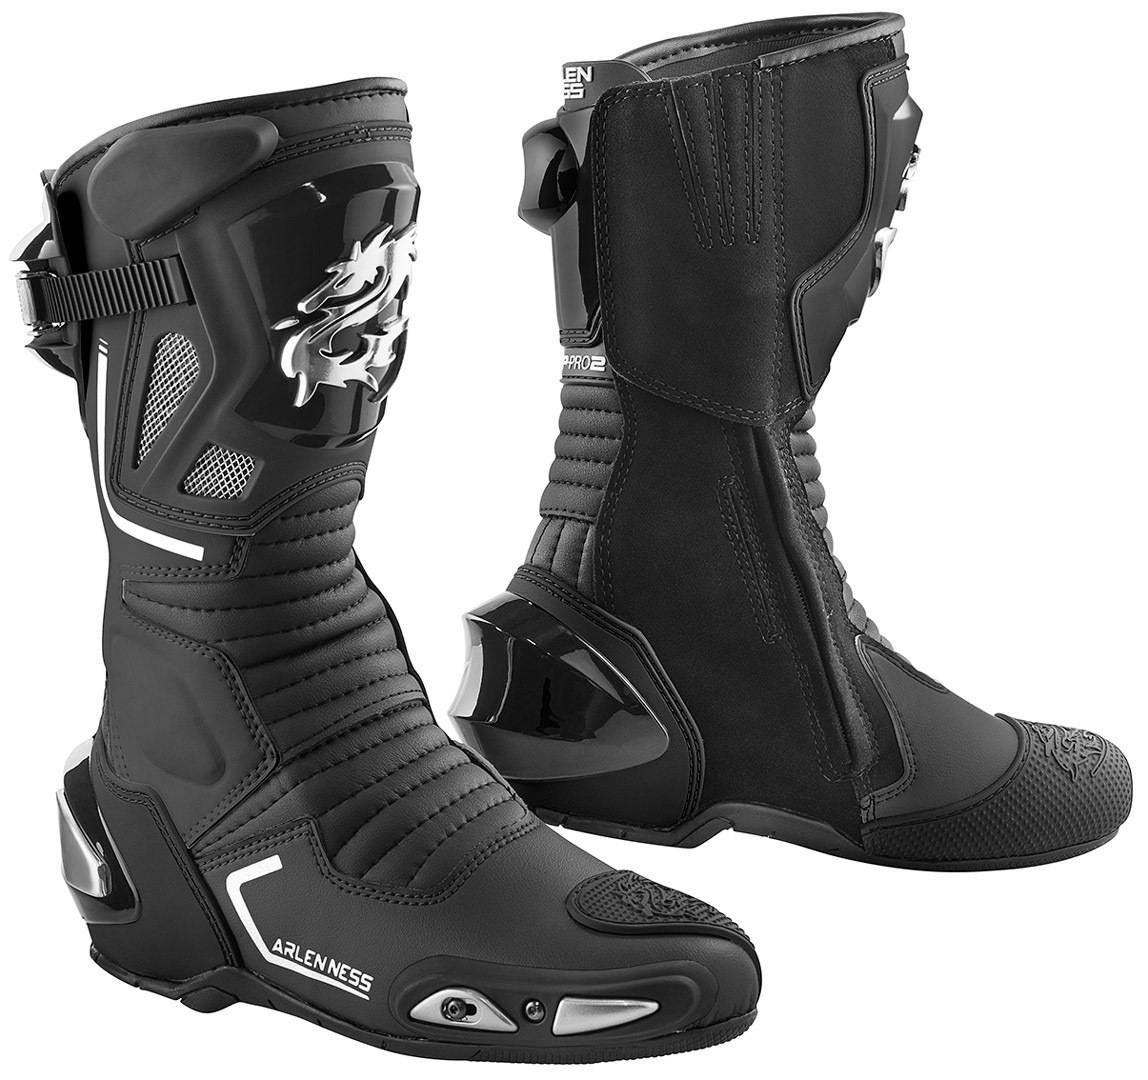 Arlen Ness Sugello Bottes de moto Noir taille : 44